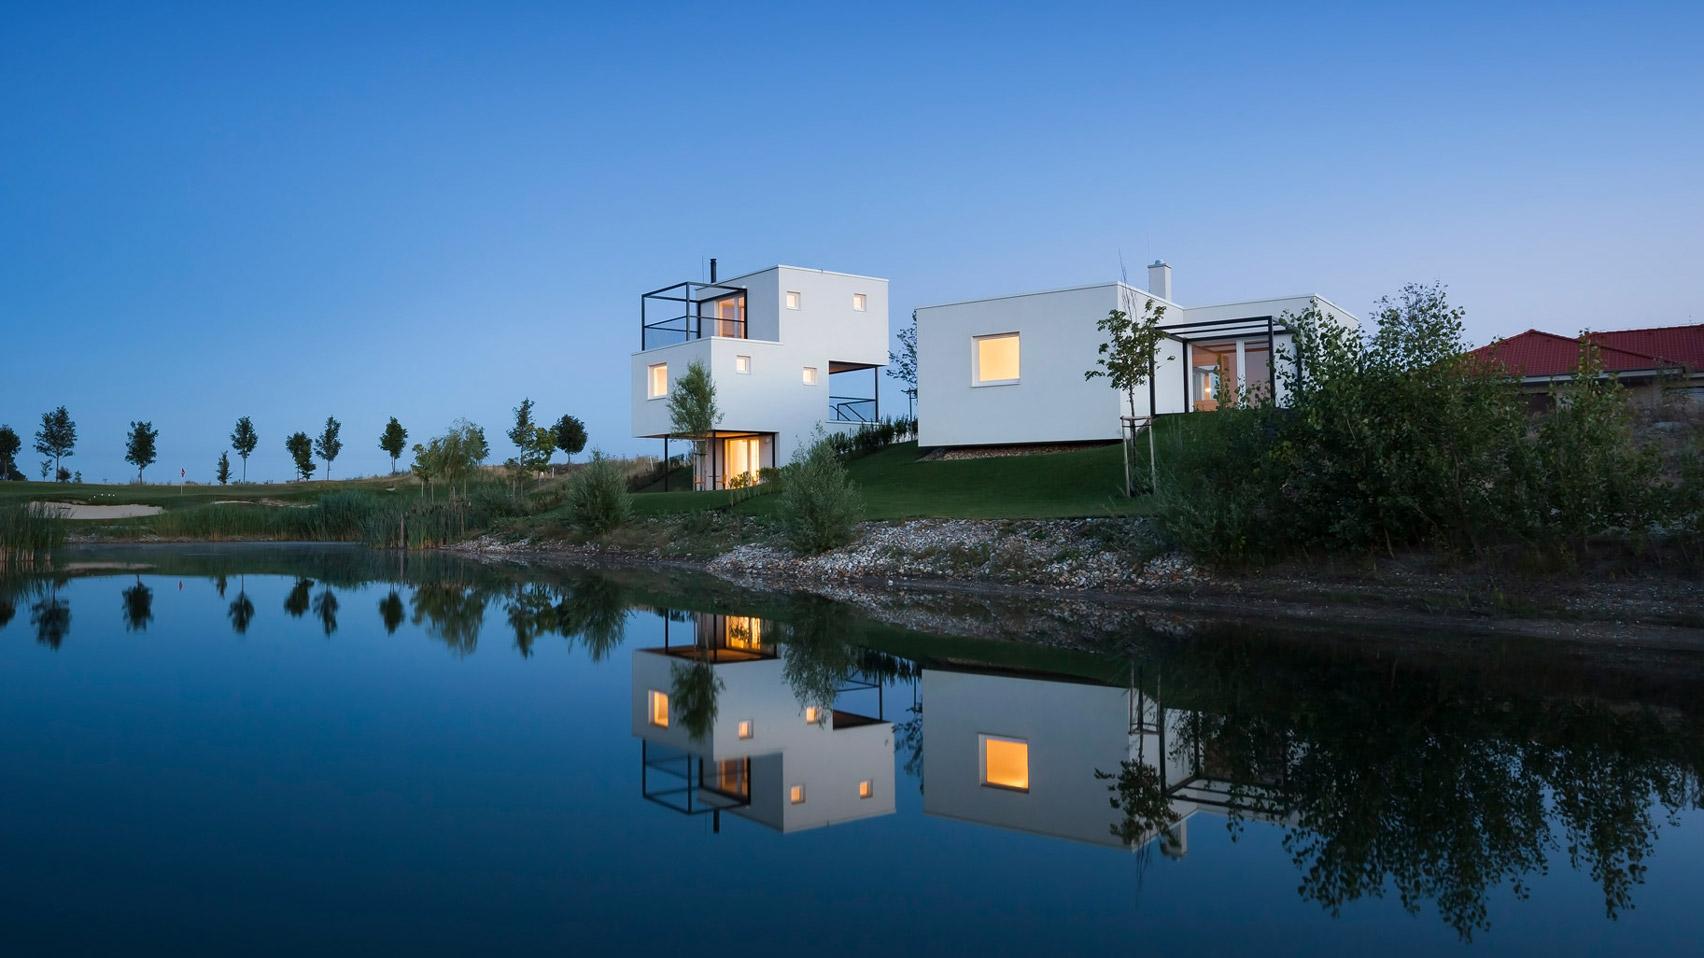 Thiết kế resort Bungalow 18